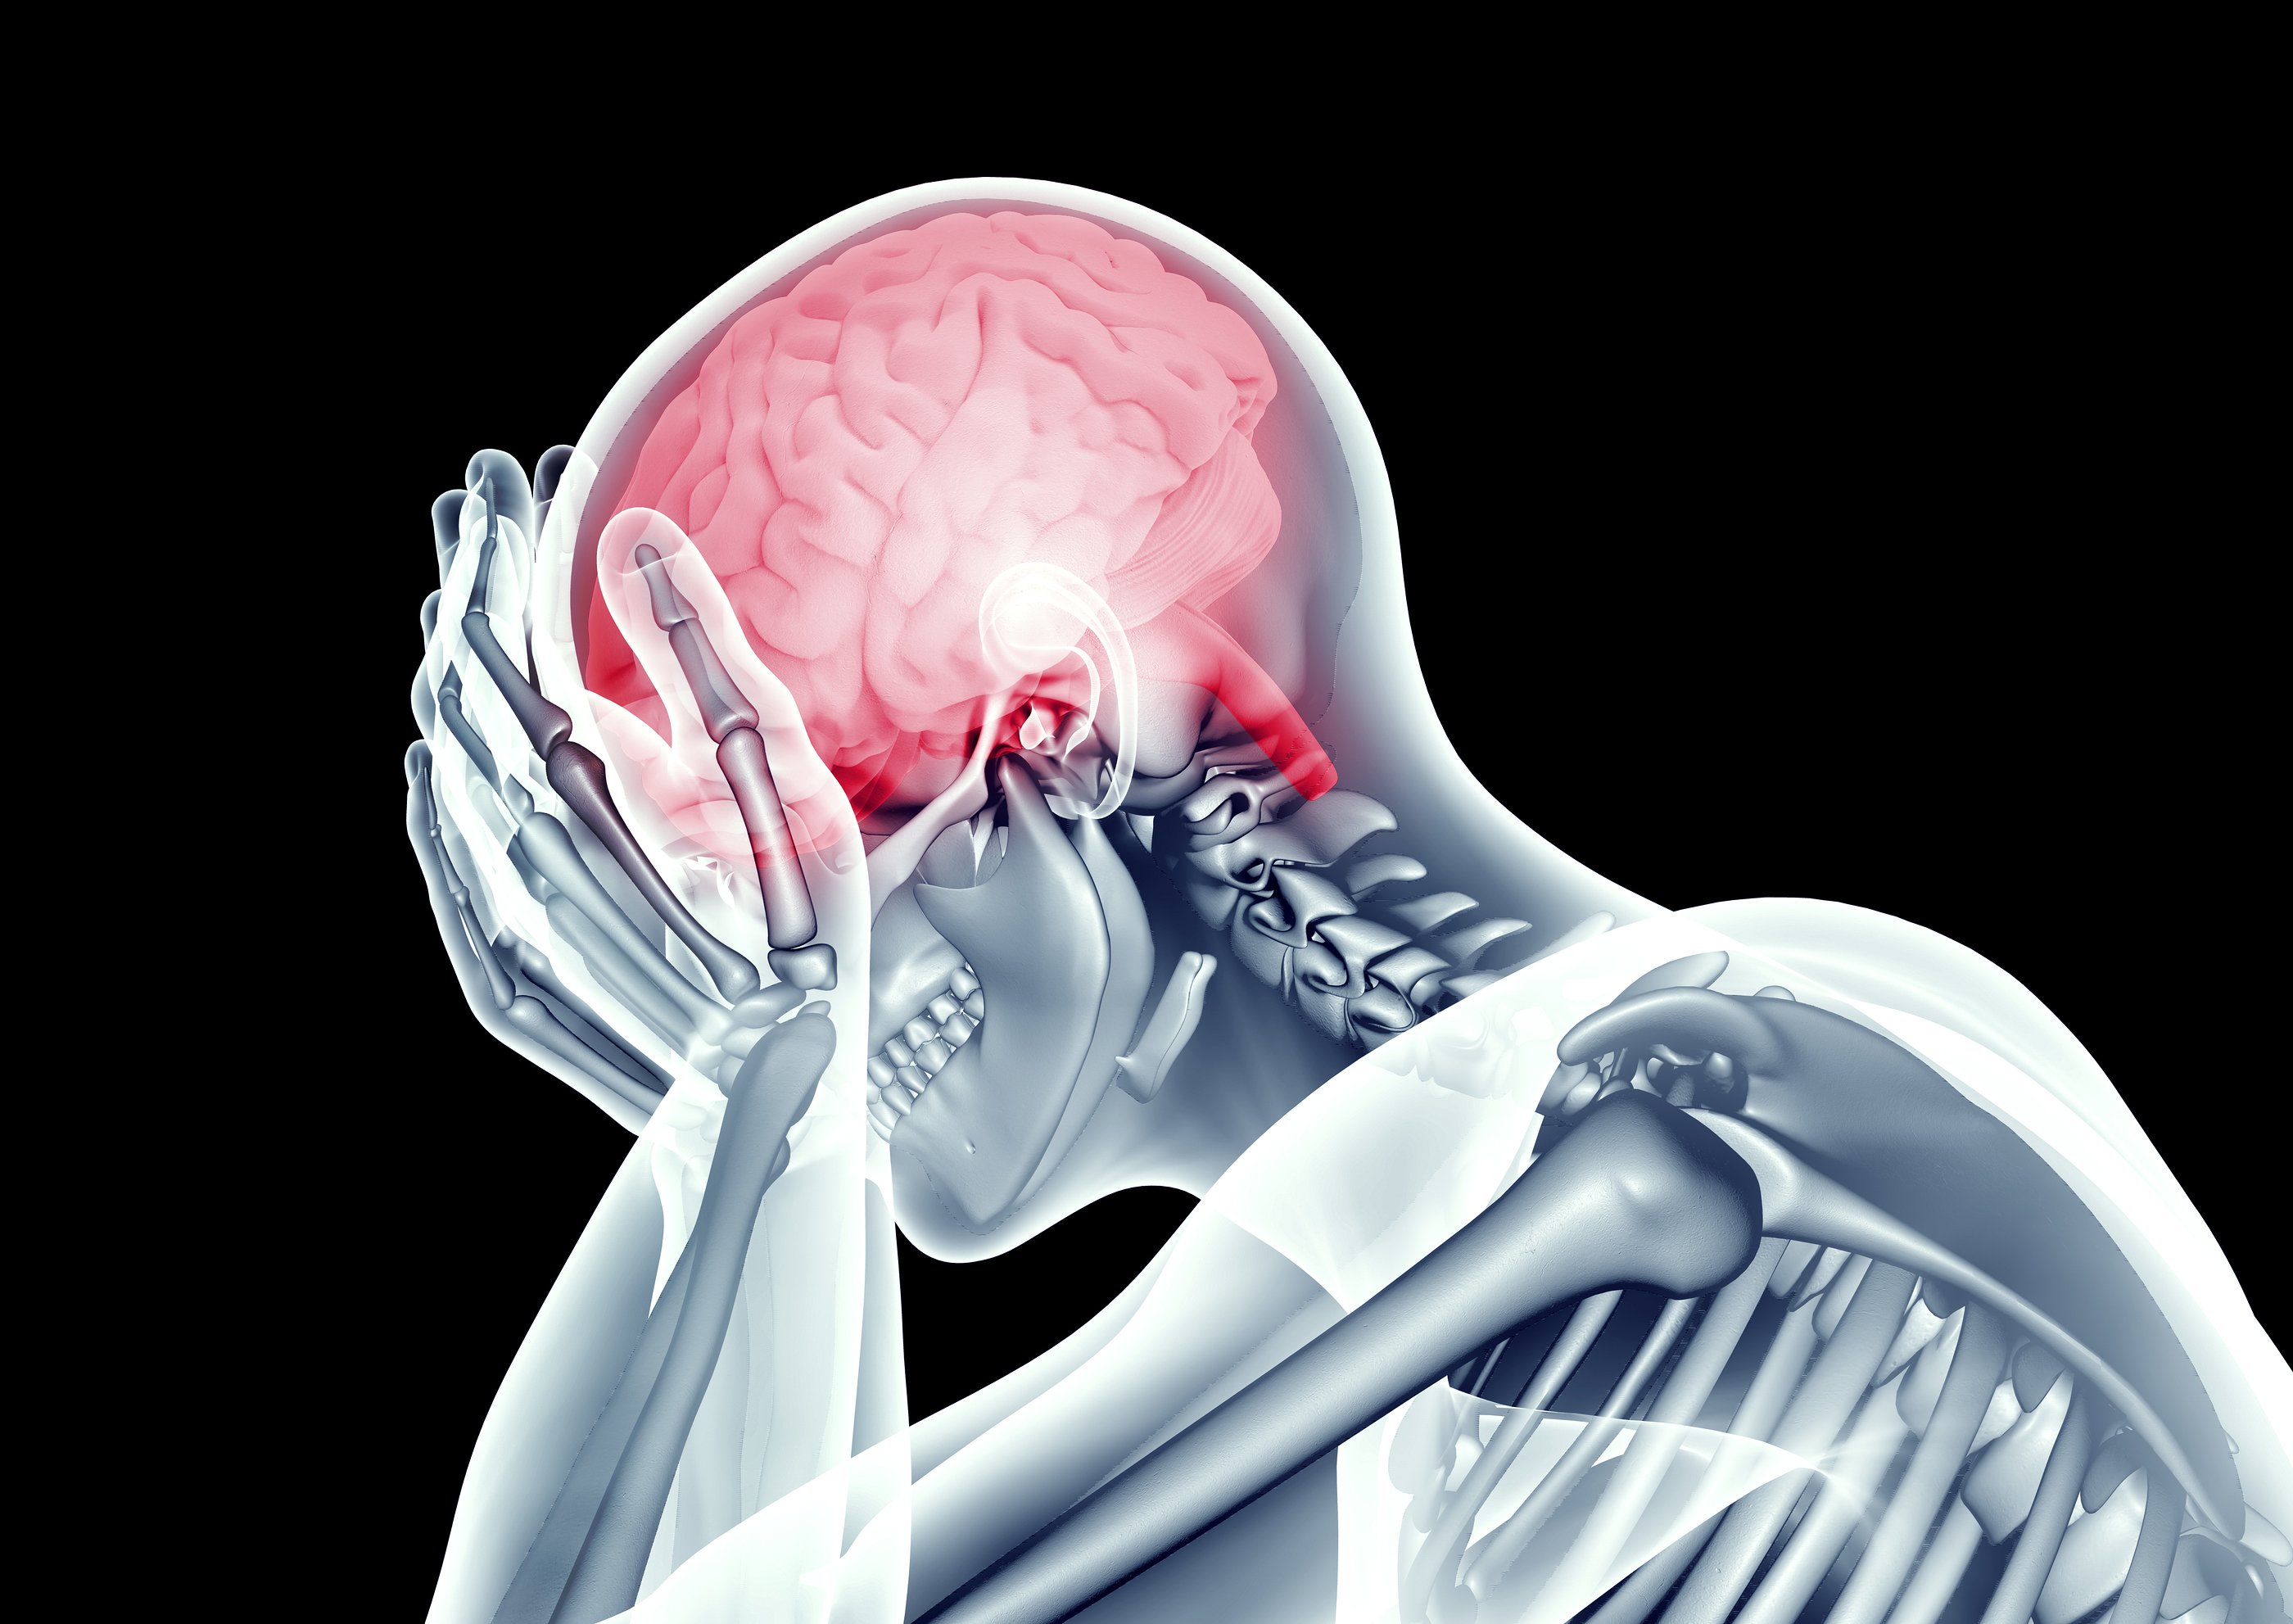 NUCCA and Headaches